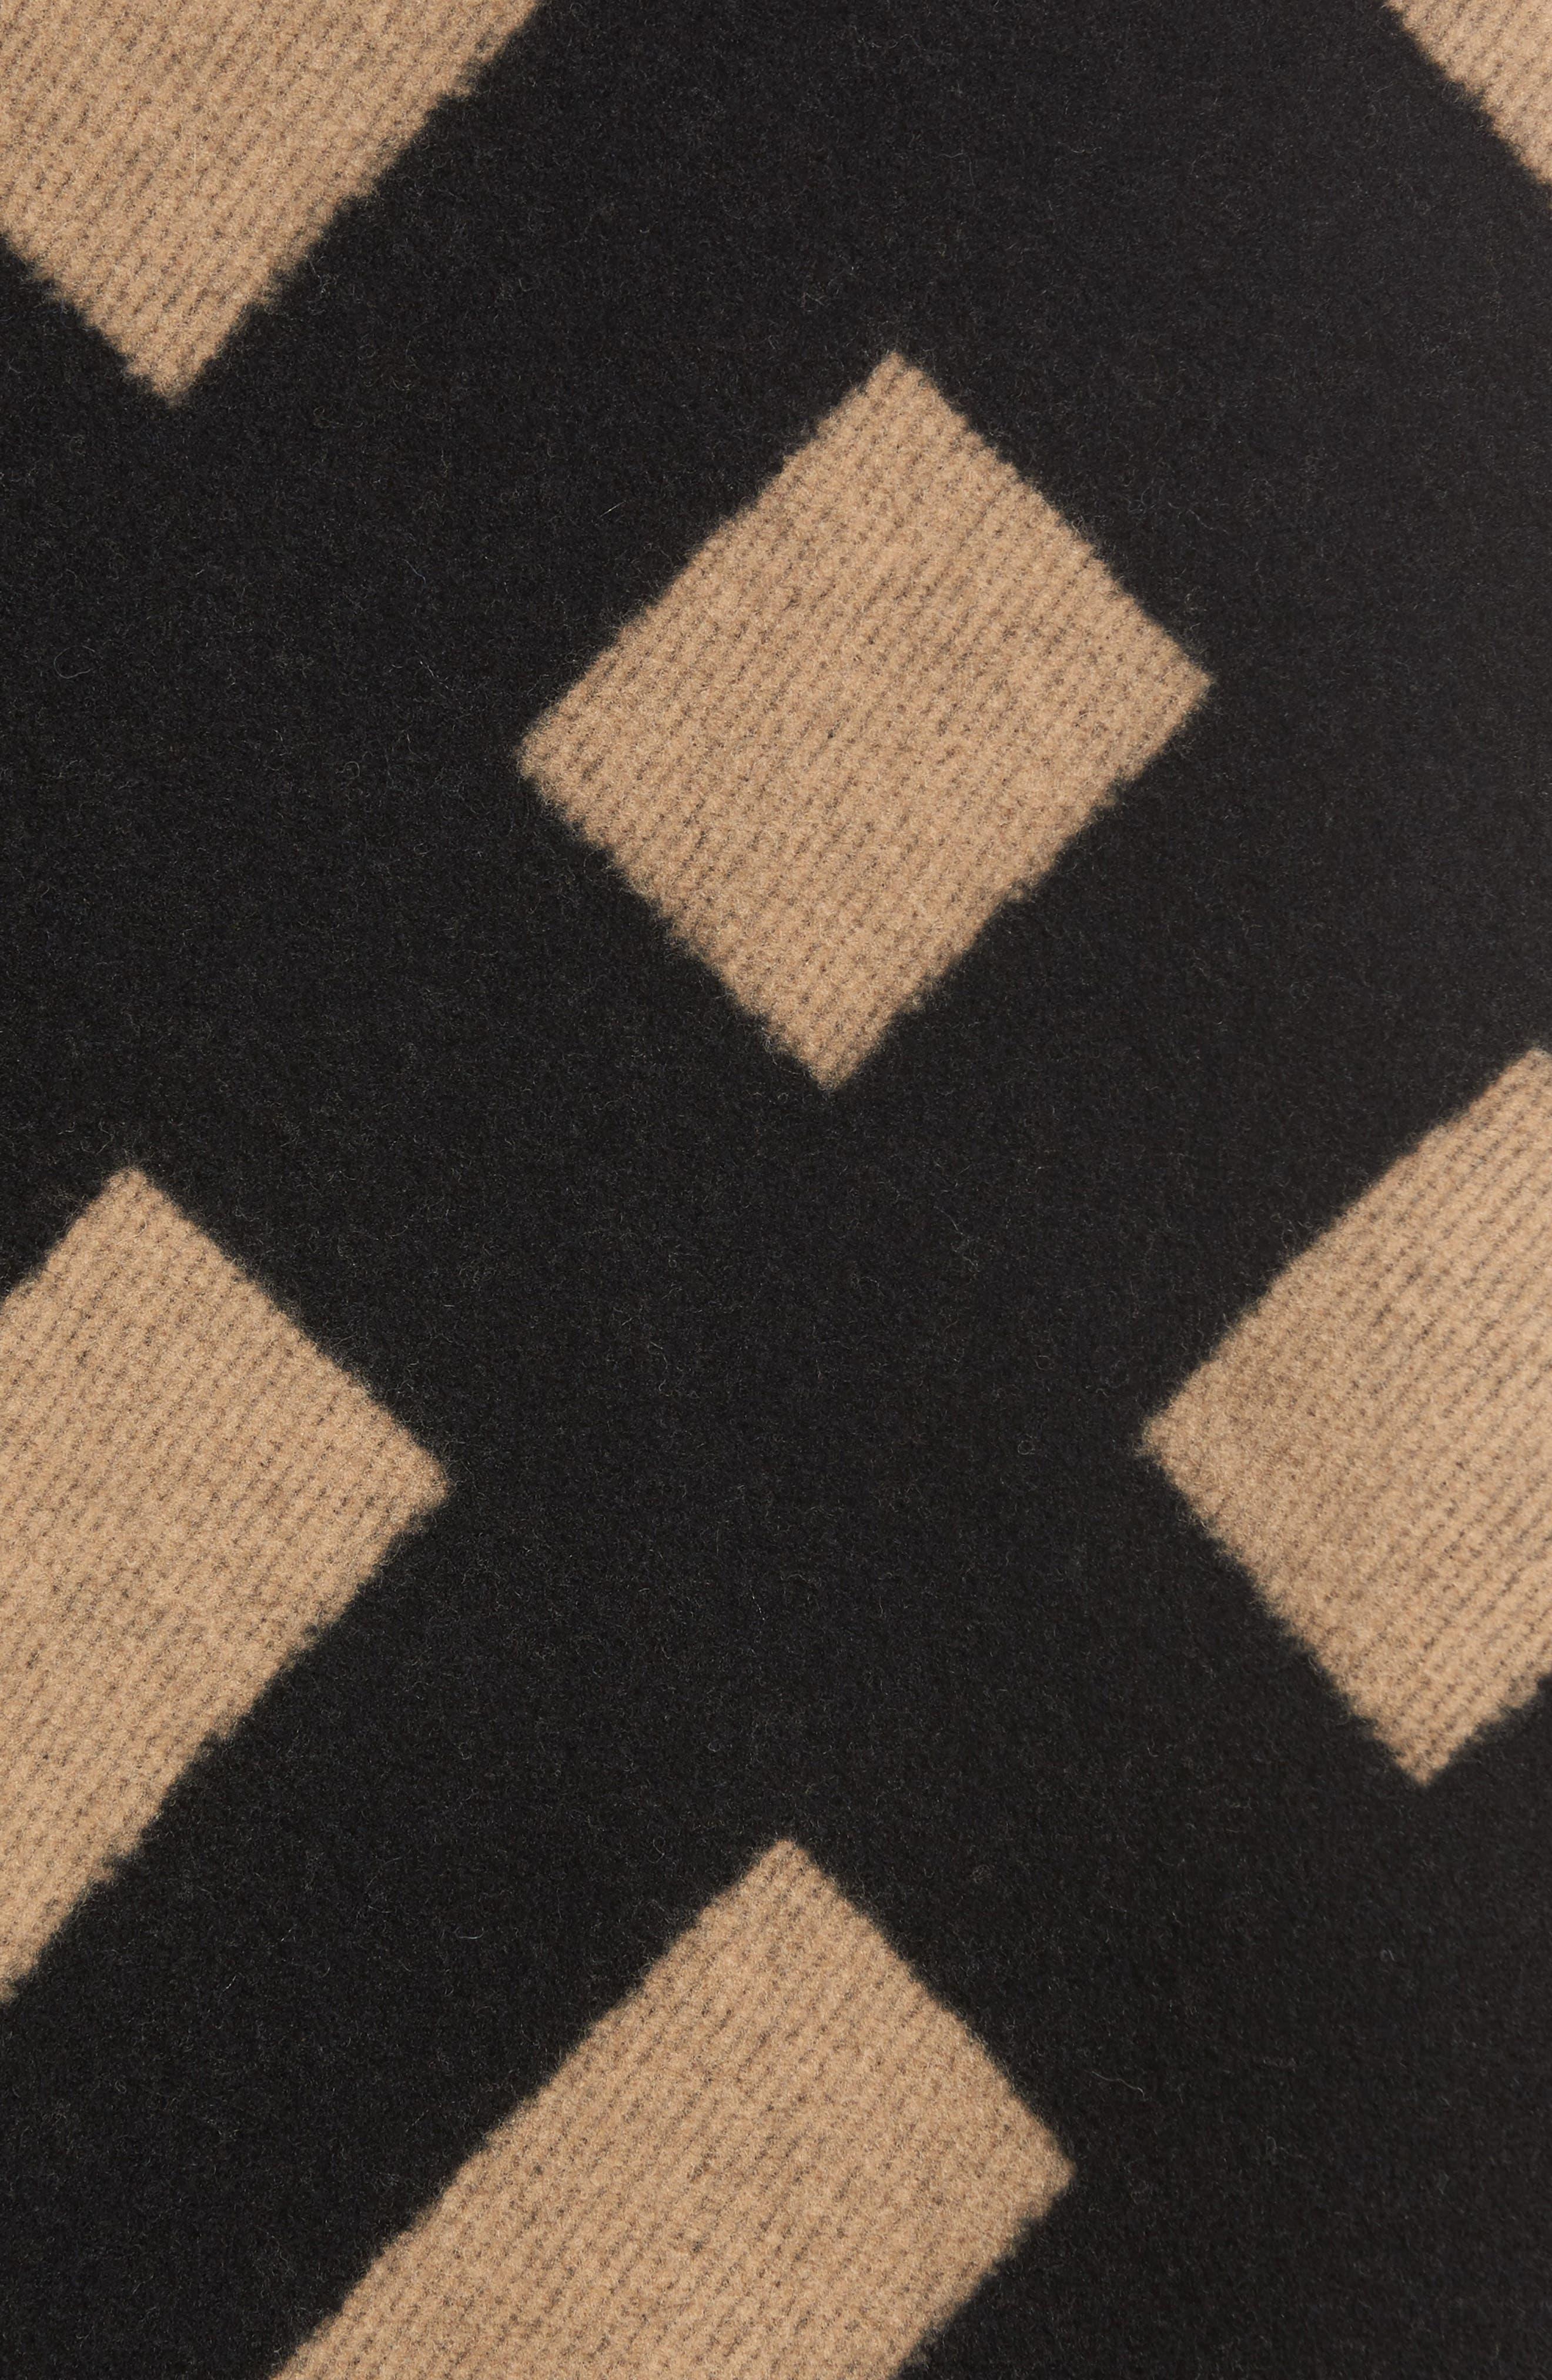 Blanket Check Wool & Cashmere Poncho,                             Alternate thumbnail 5, color,                             CAMEL/ BLACK